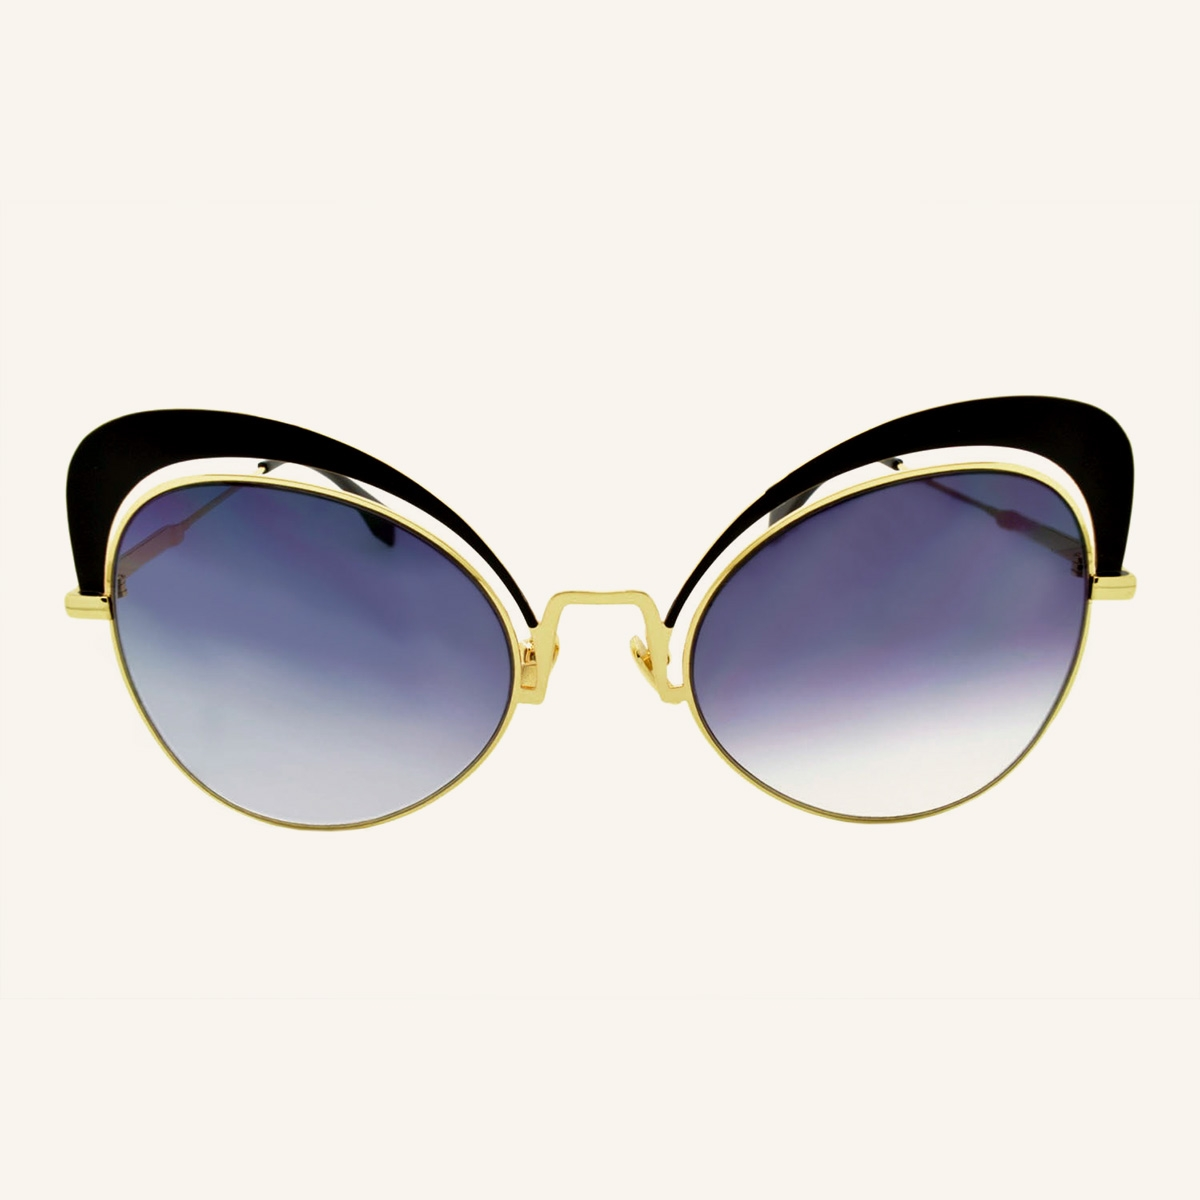 Oversized butterfly sunglasses 70's